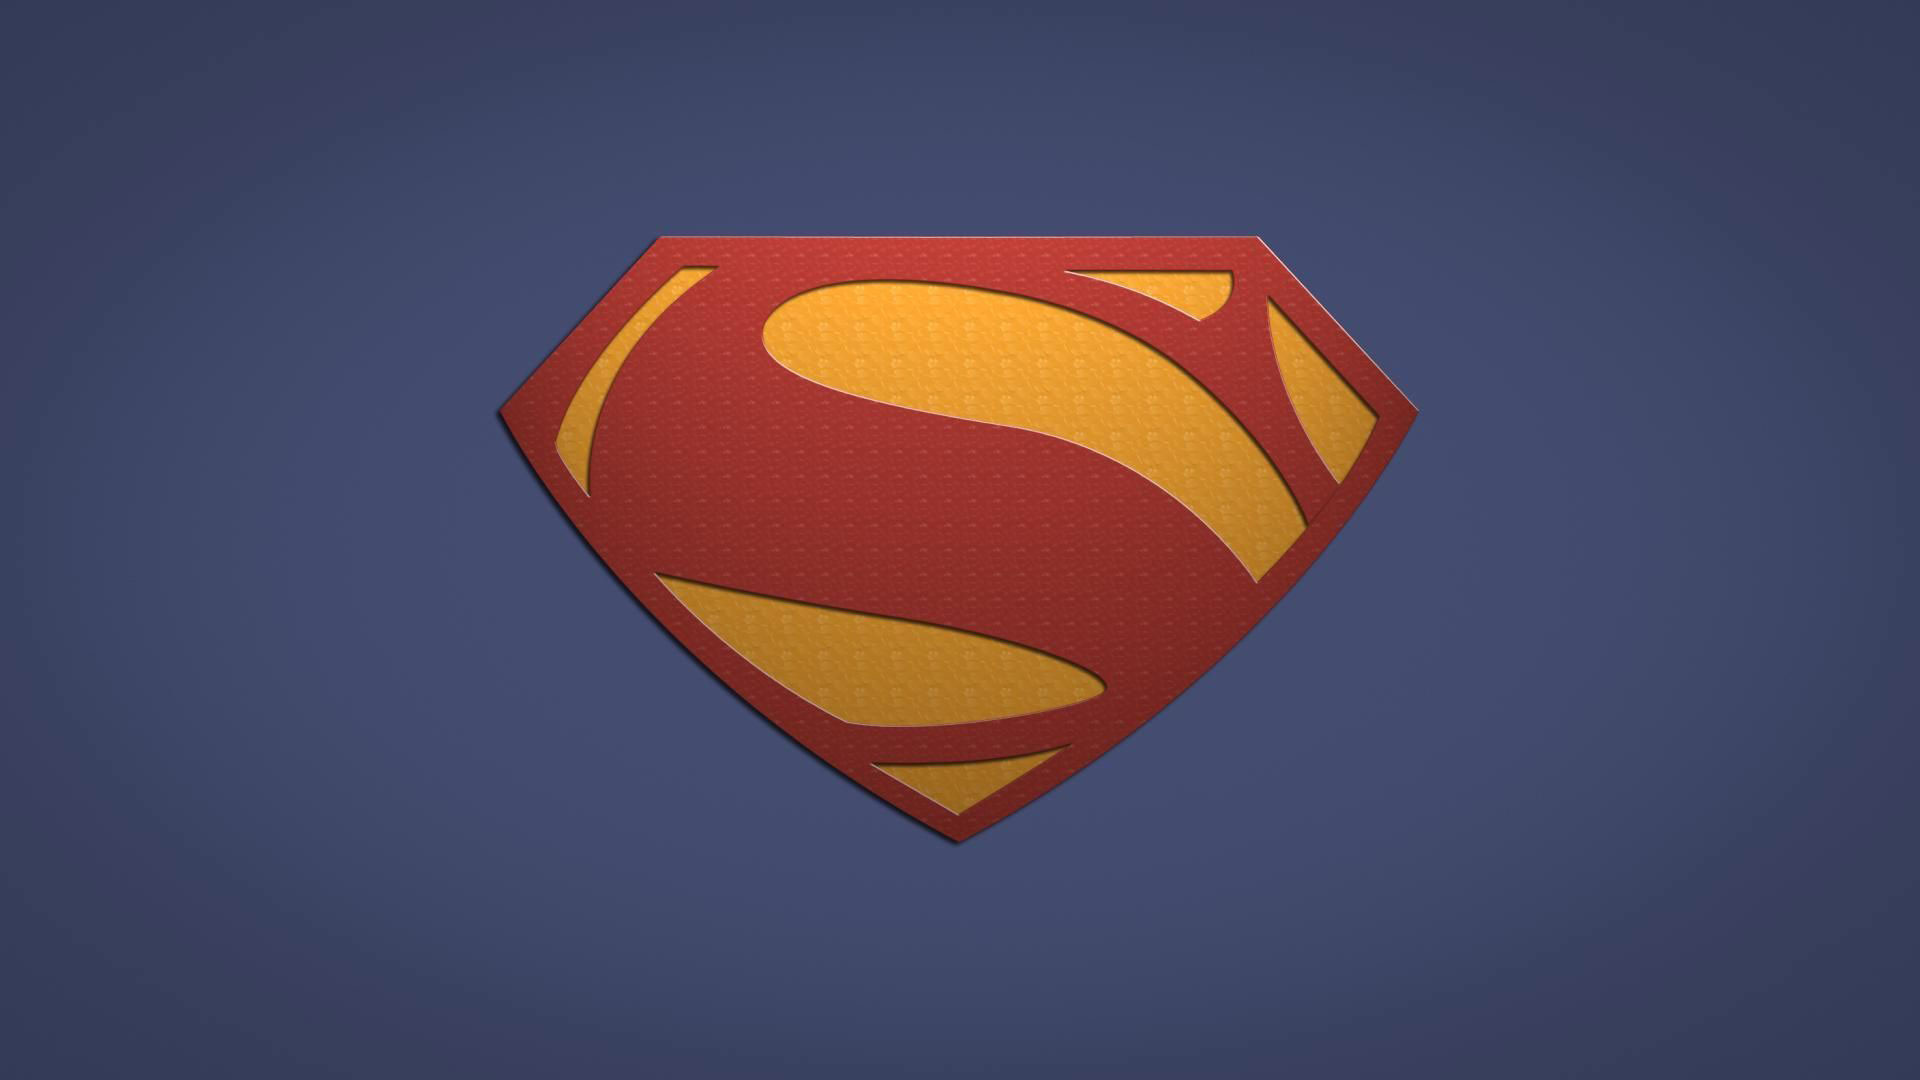 superman logo hd wallpaper 64 images